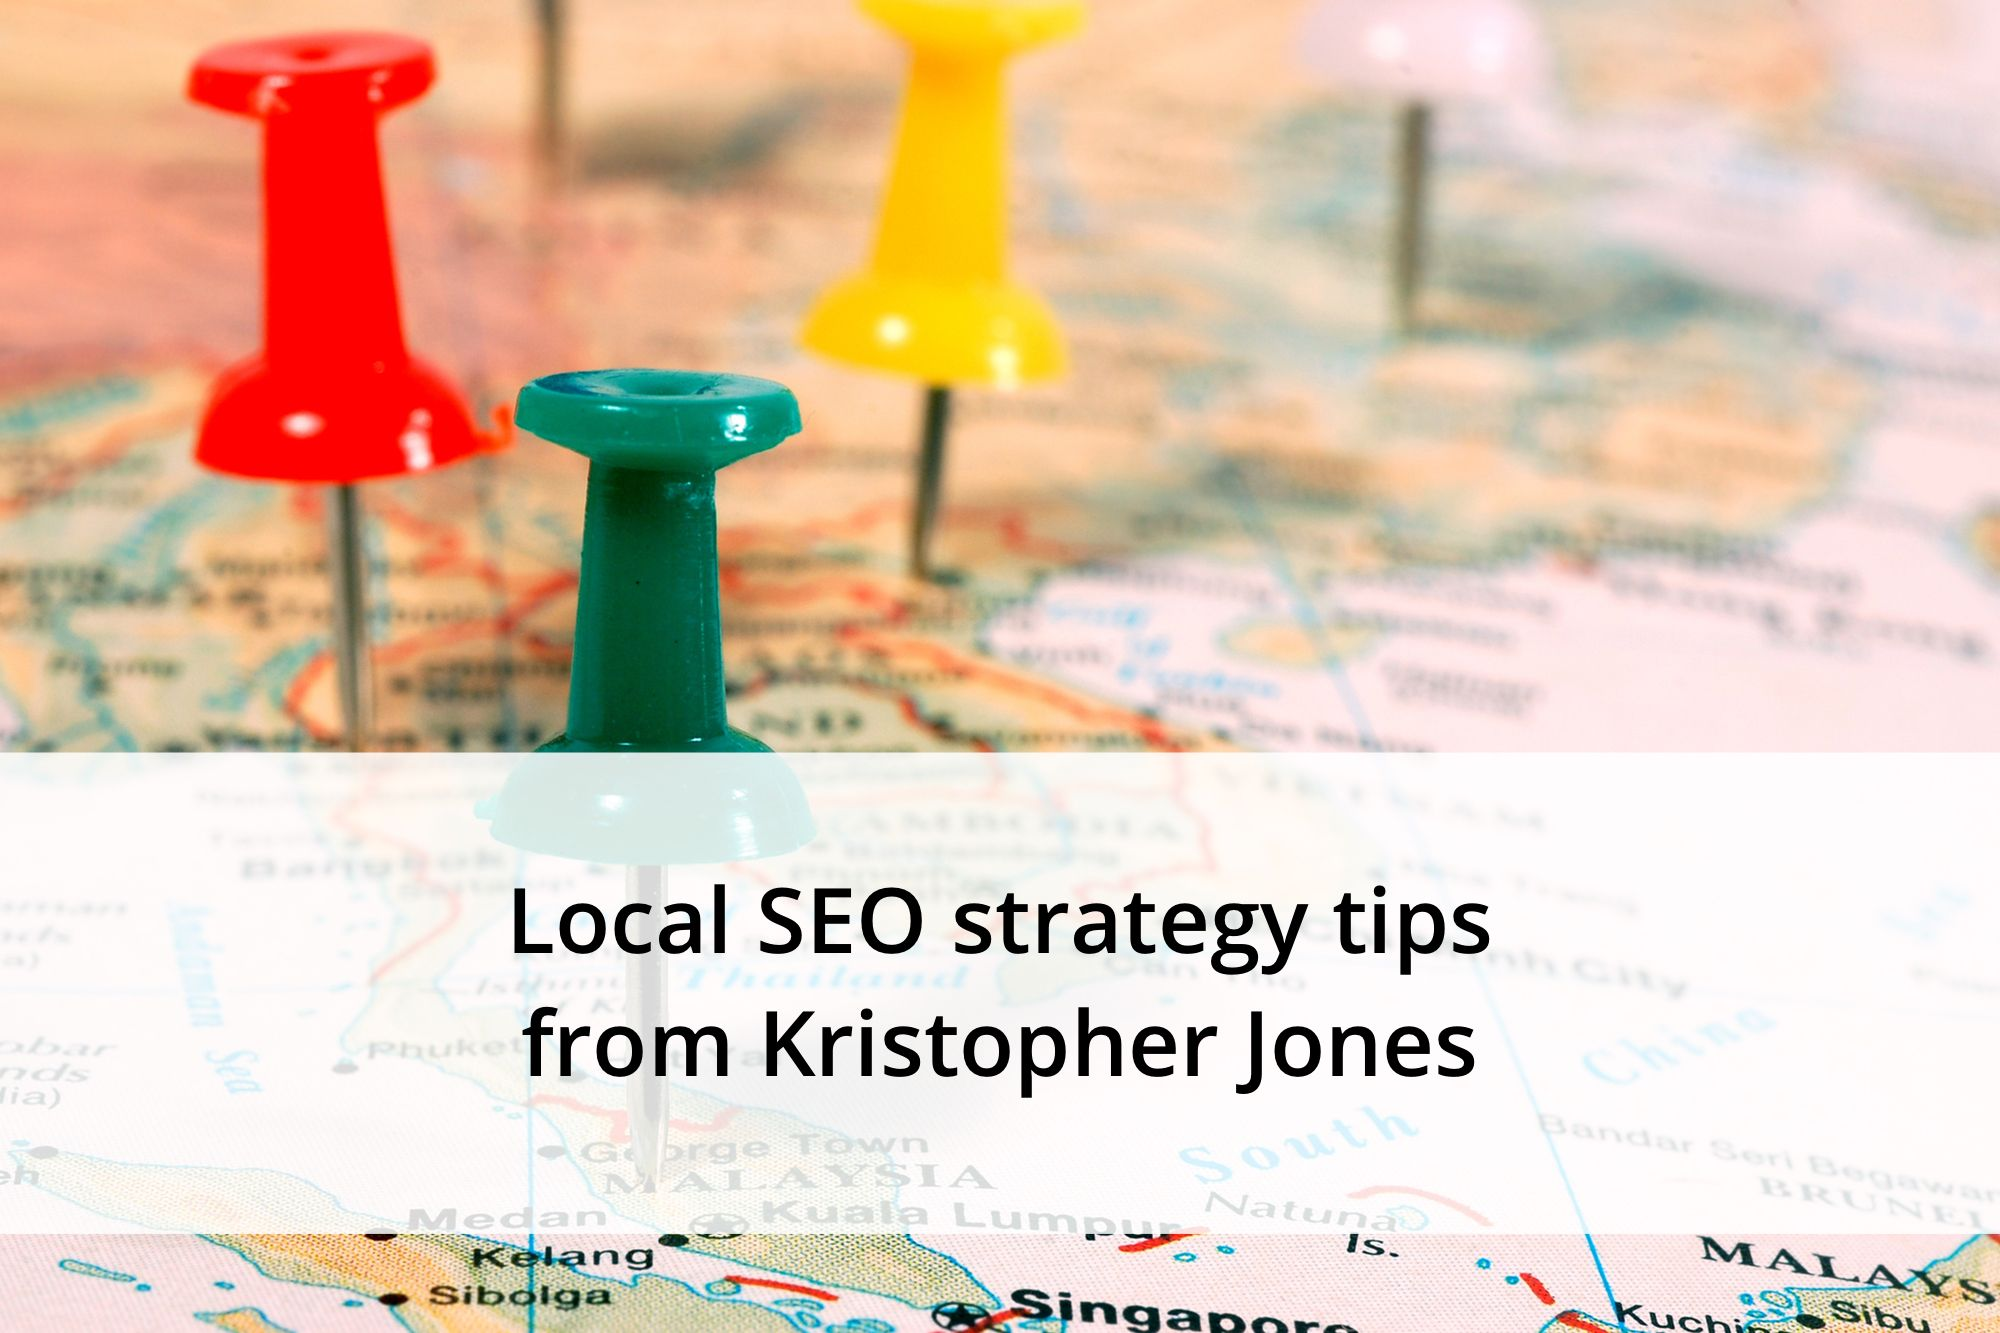 Local SEO strategy tips from Kristopher Jones | Biz Wiz